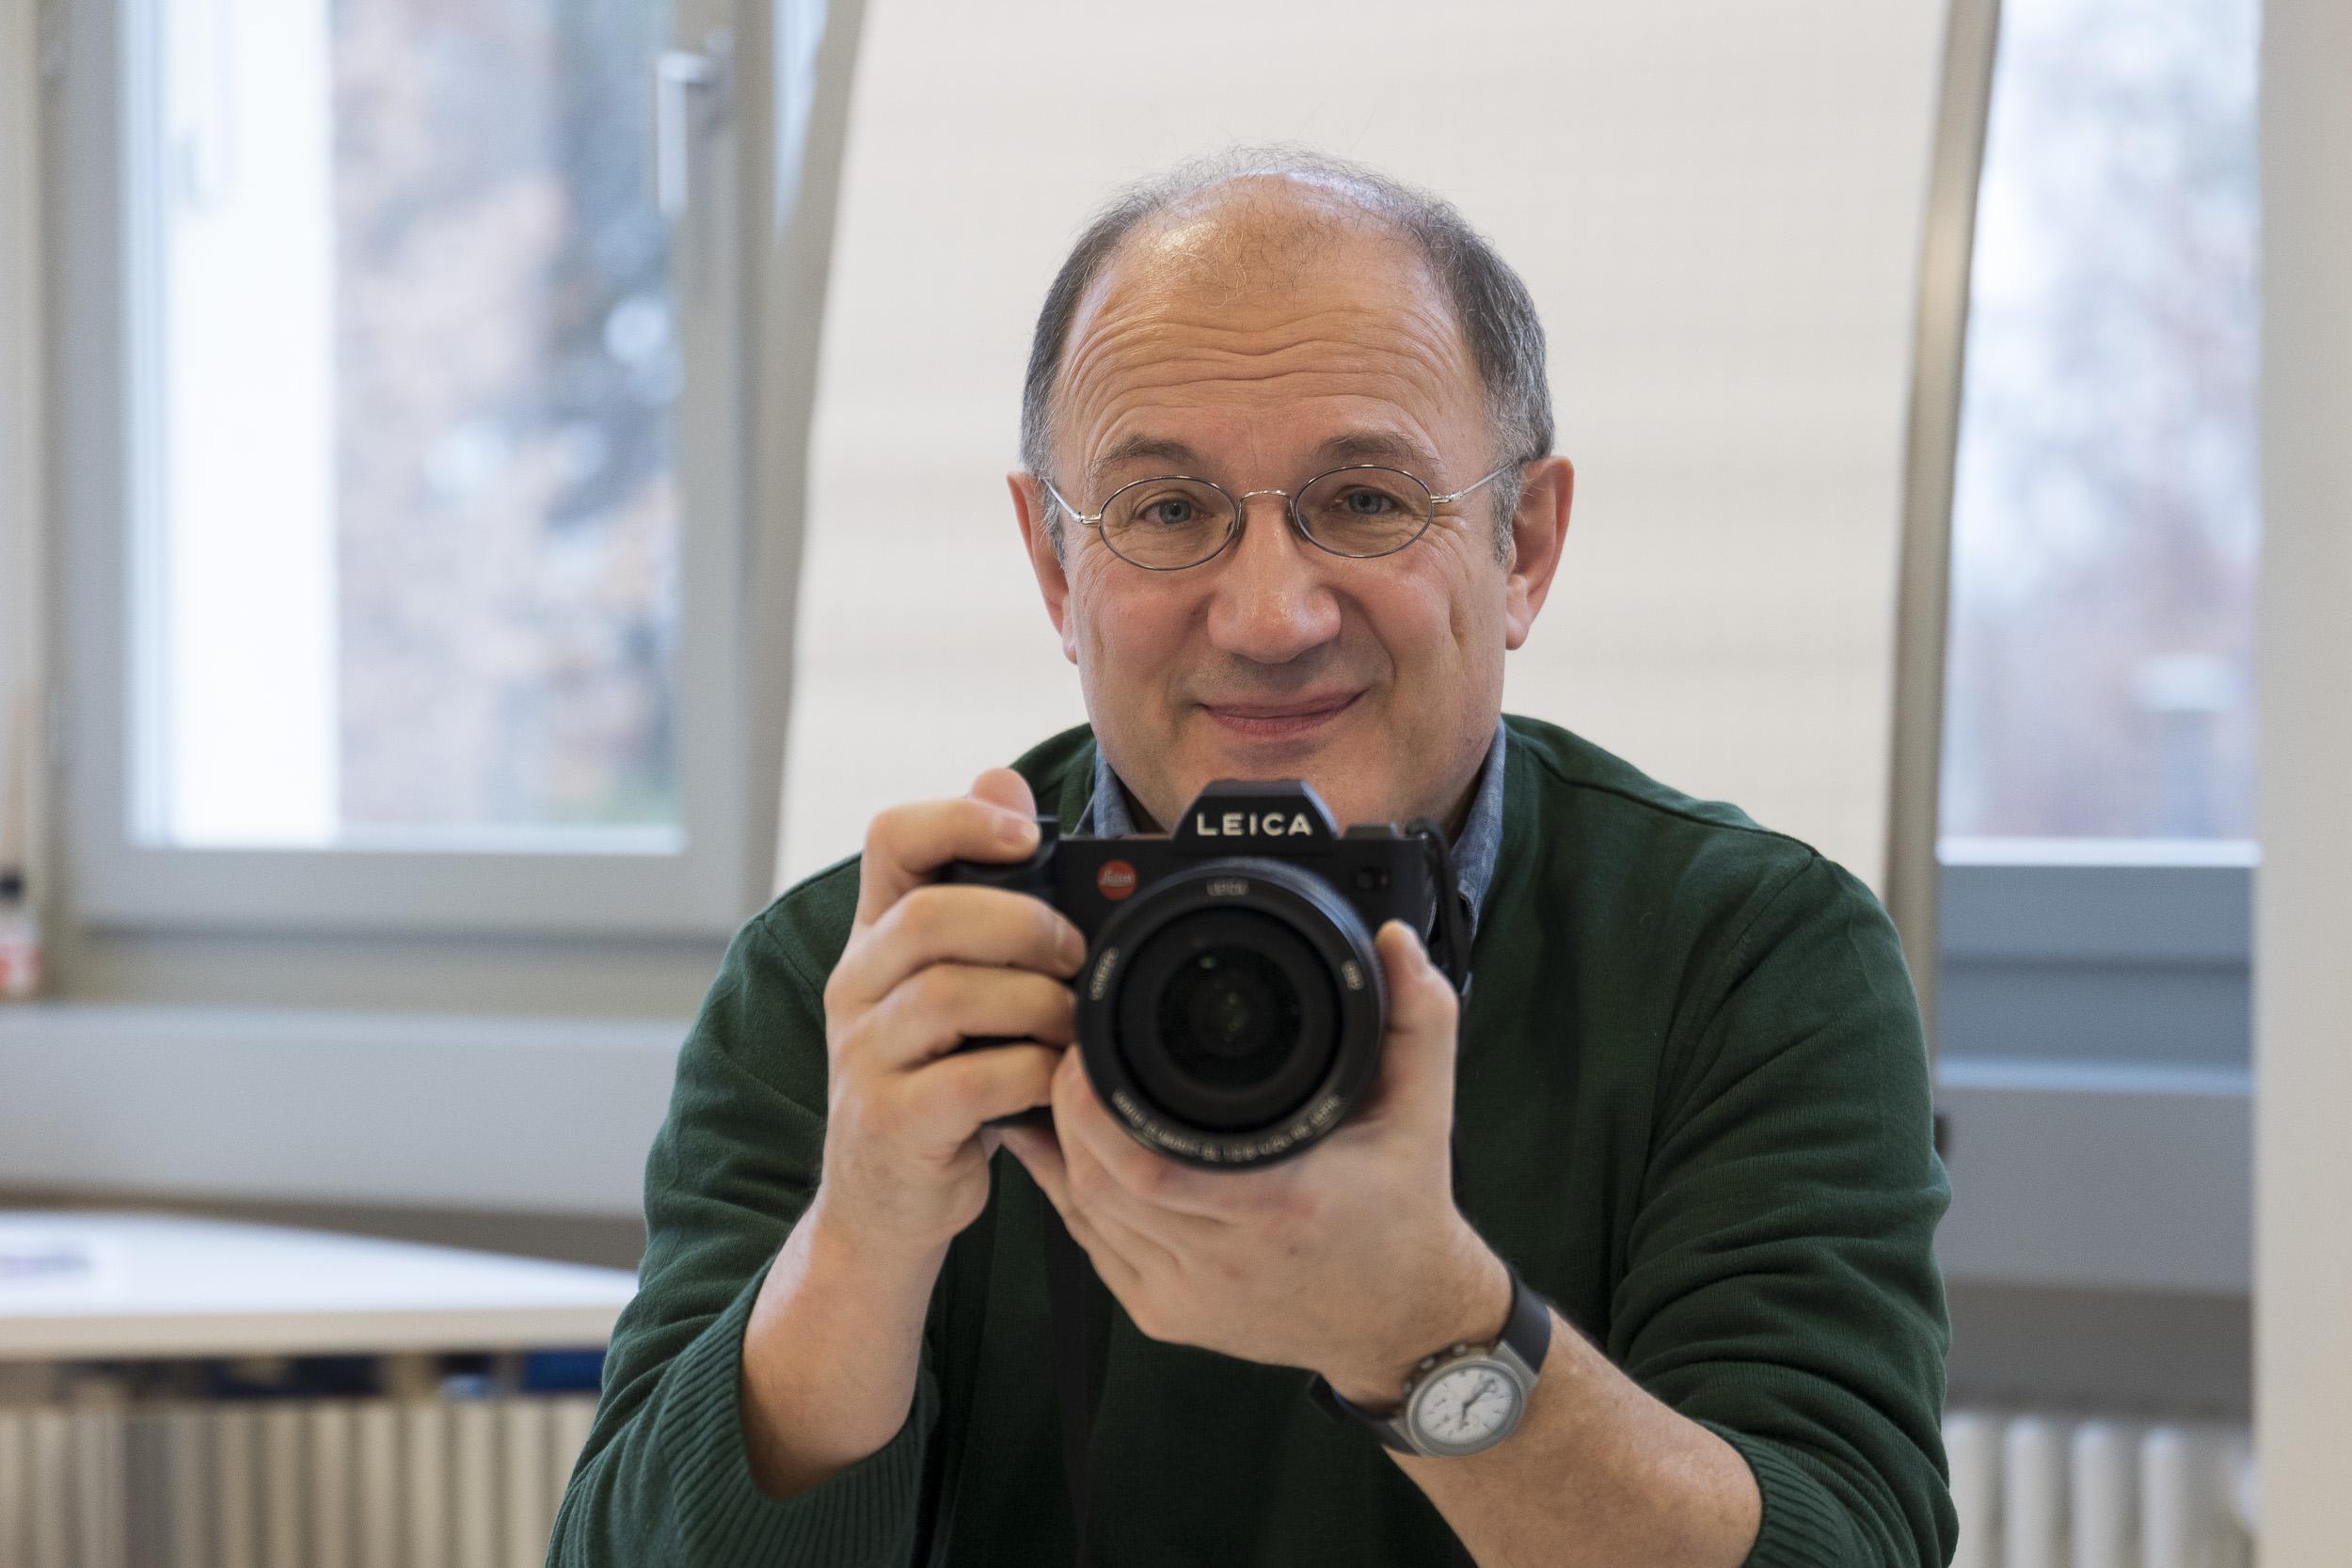 Foto: Peter Schäublin / Leica SL / Vario-Elmarit SL 2.8 24-90 ASPH auf 88 mm / 1/60 sec. f 4.0 640 ISO